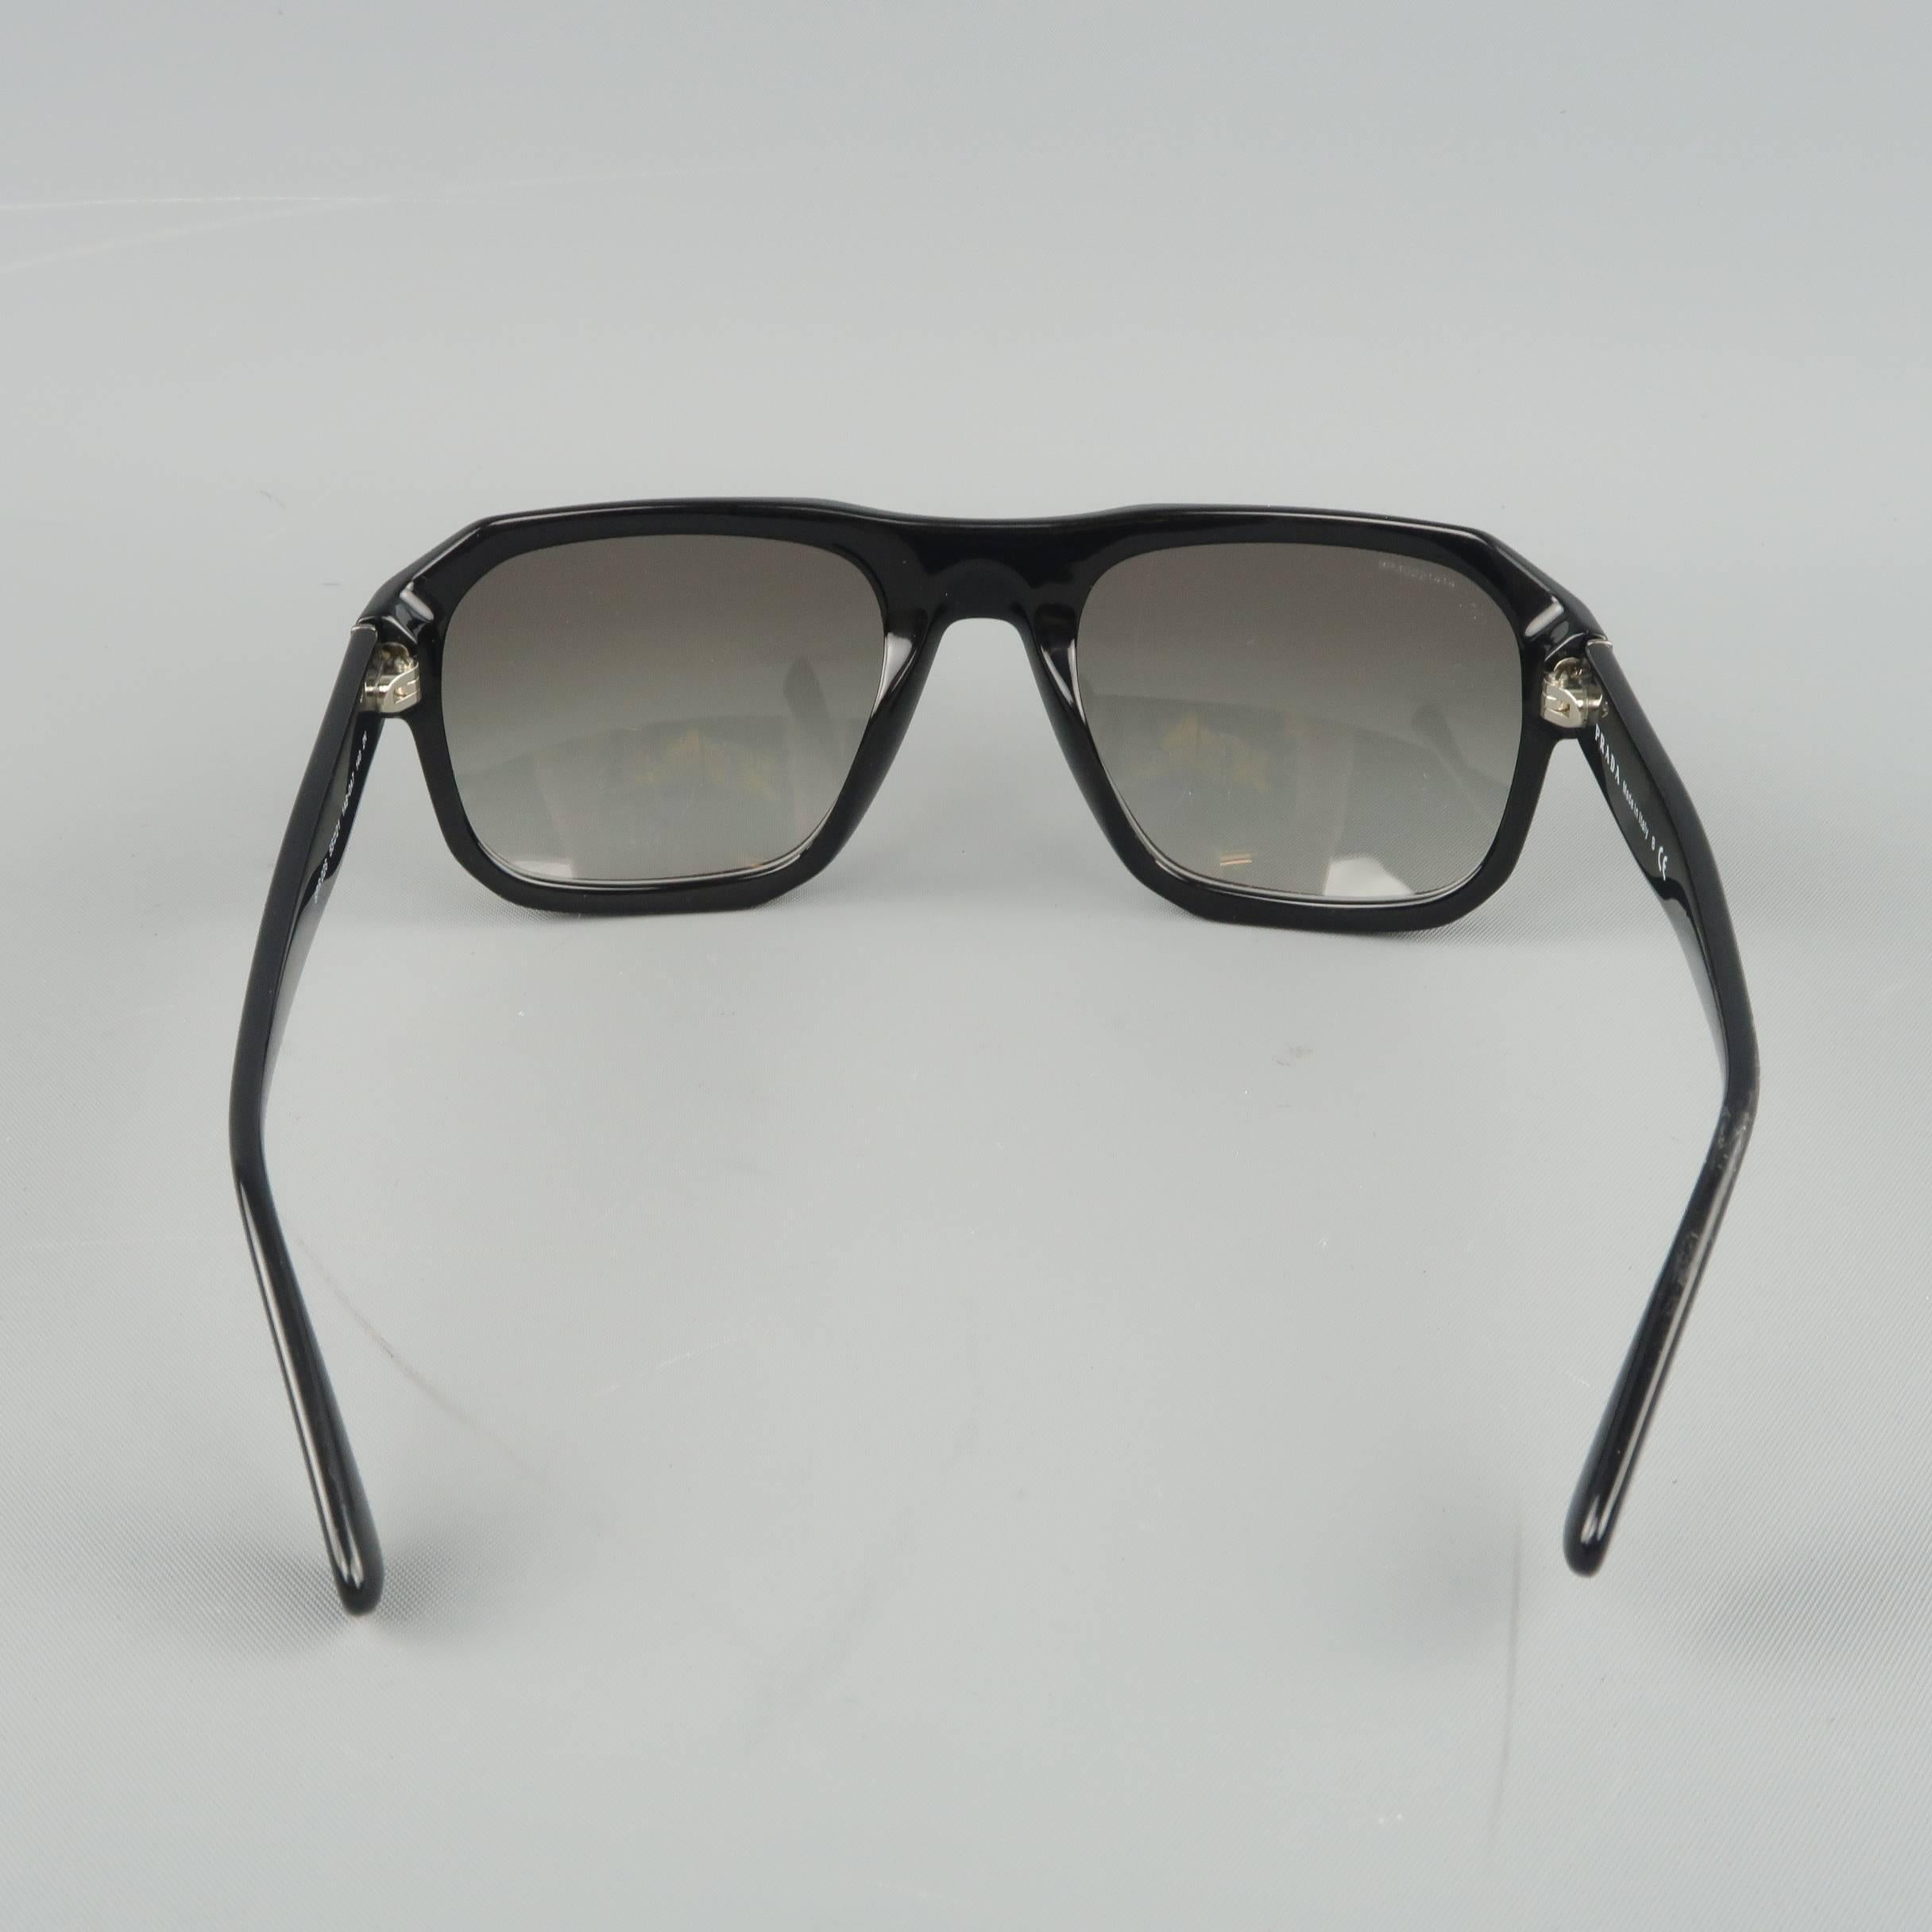 d106e65c0845 ... store prada sunglasses black acetate spr 02s flat top spring for sale 1  48218 d0fff